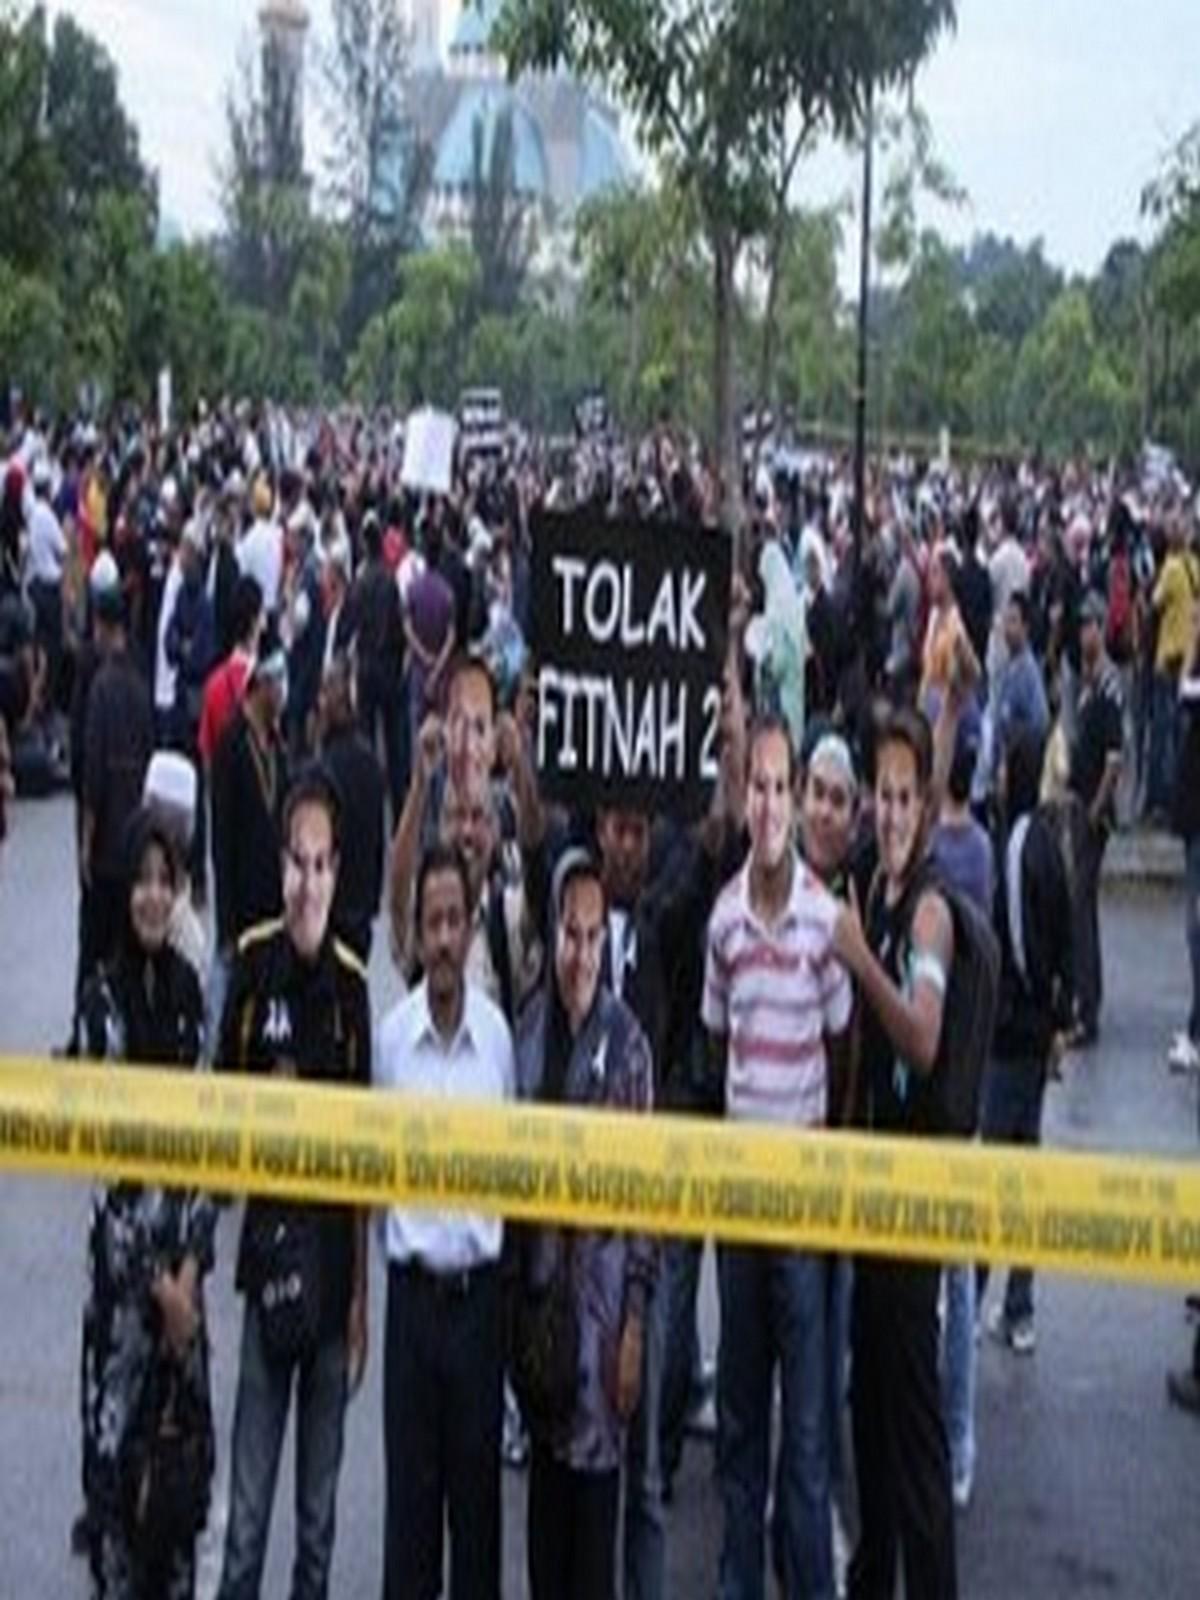 Anwar bebas3 300x200 - Pembebasan Anwar: Blogger Pro Umno-BN Cabar Peguam Negara